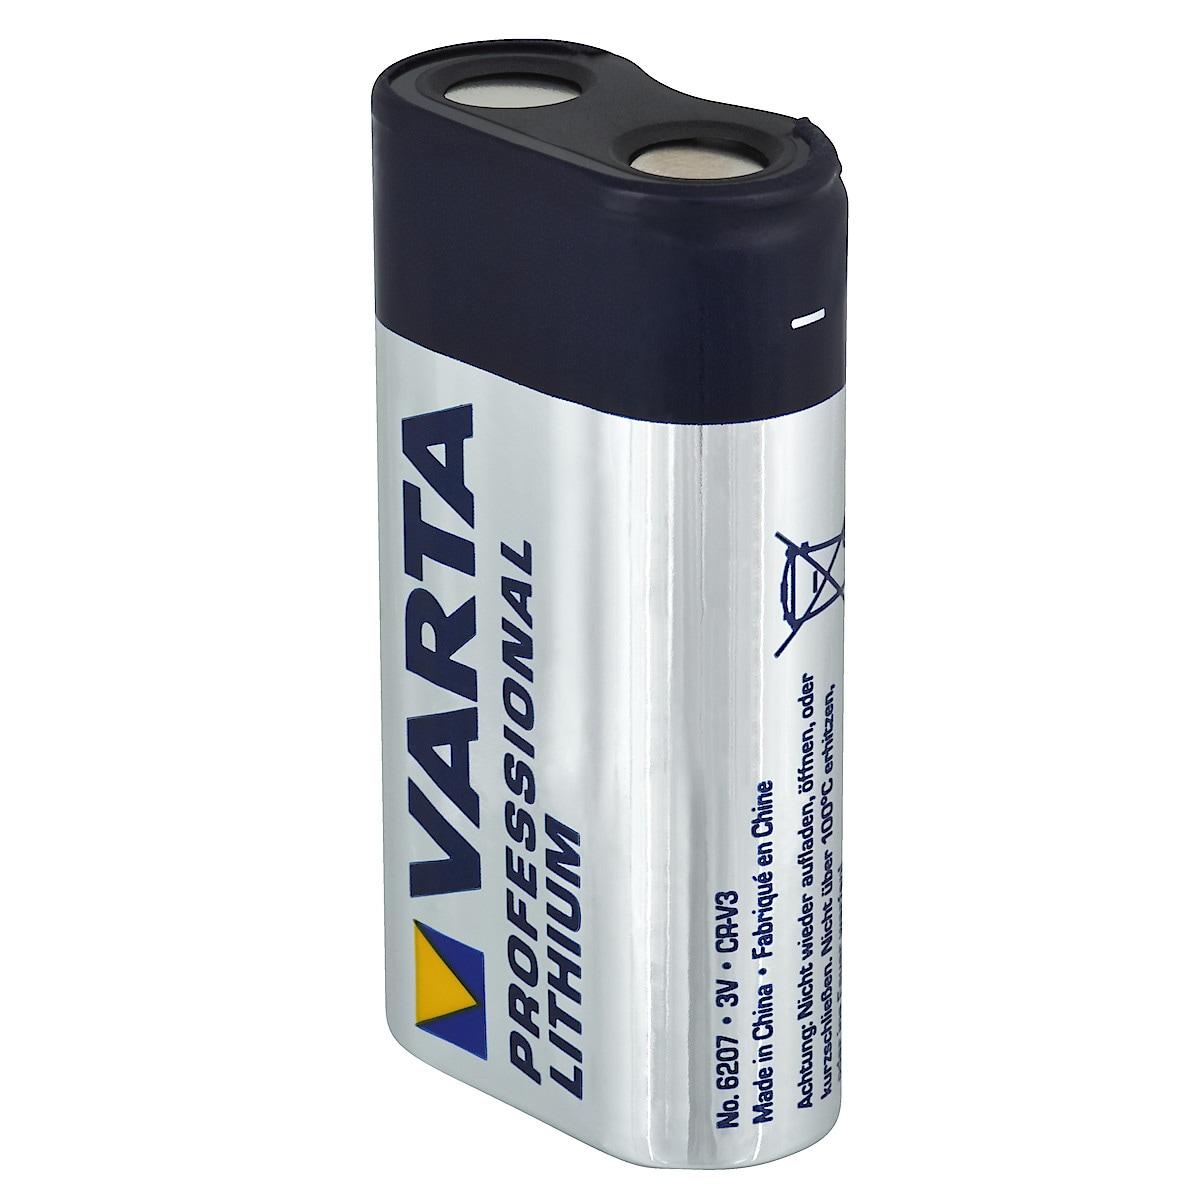 VARTA CR-V3 Lithium Battery